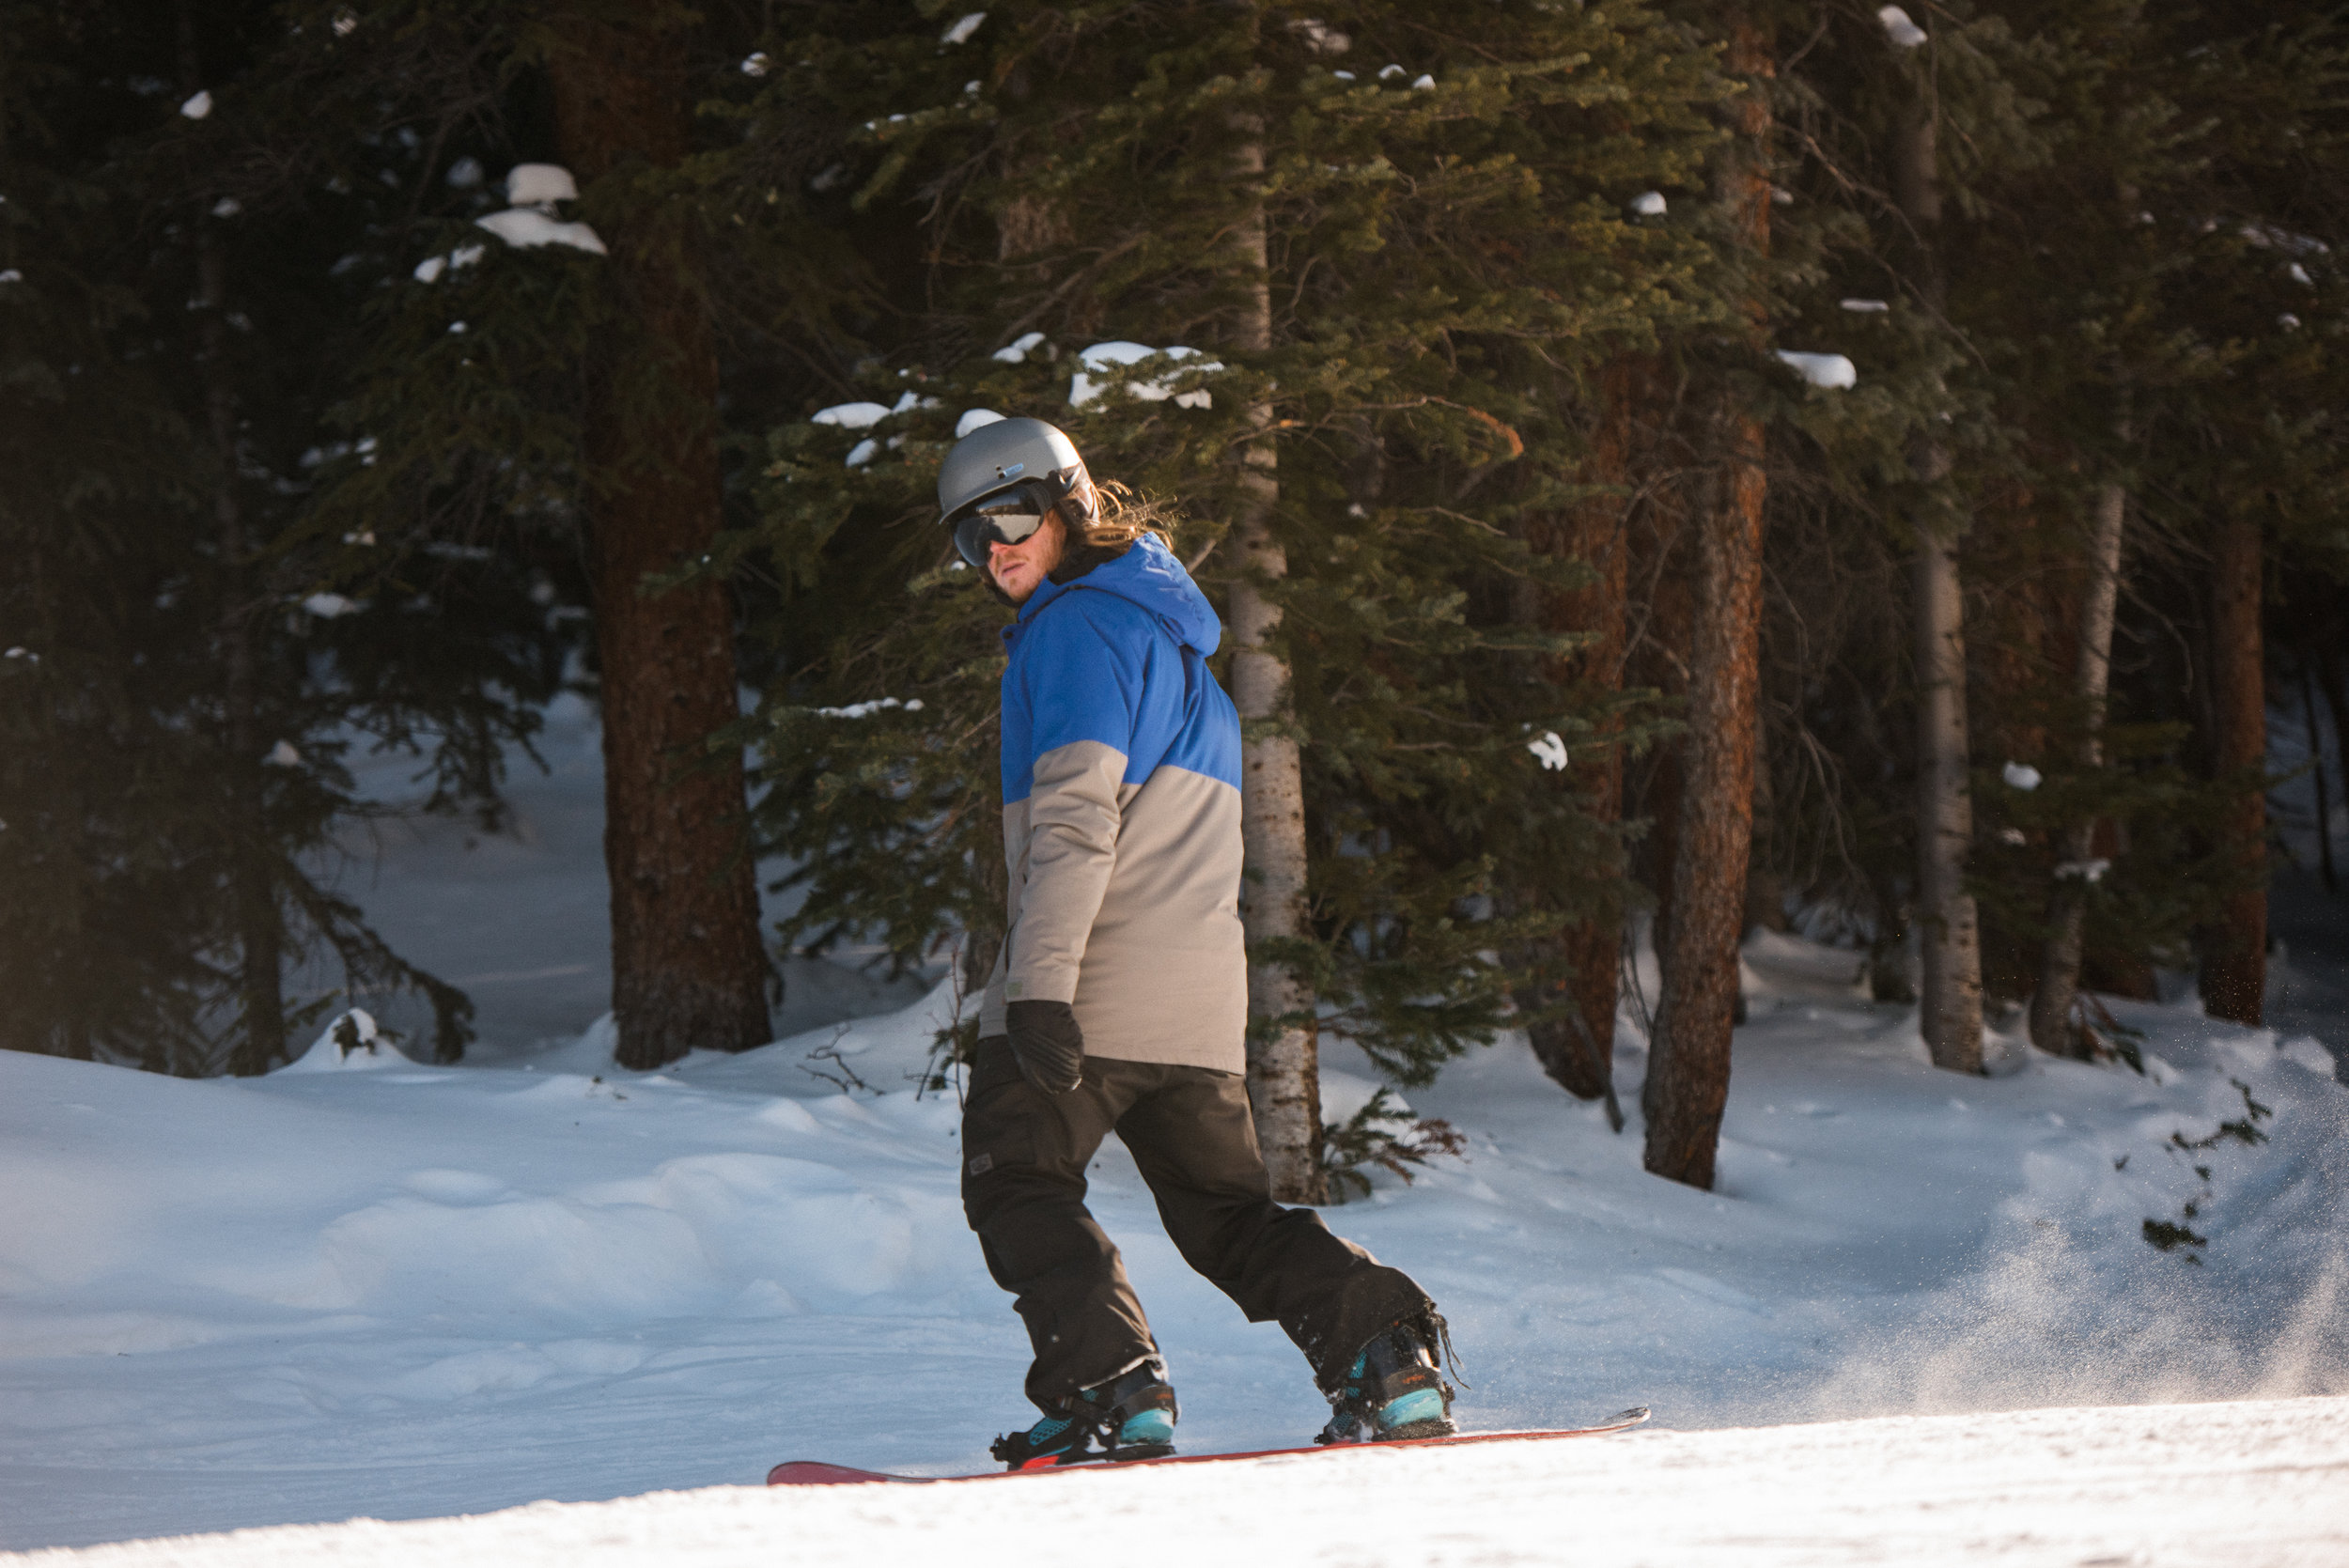 TaraShupe_Outdoor_Photographer_Loweprobags_Colorado_Copper_Mountains_Ski_42.jpg